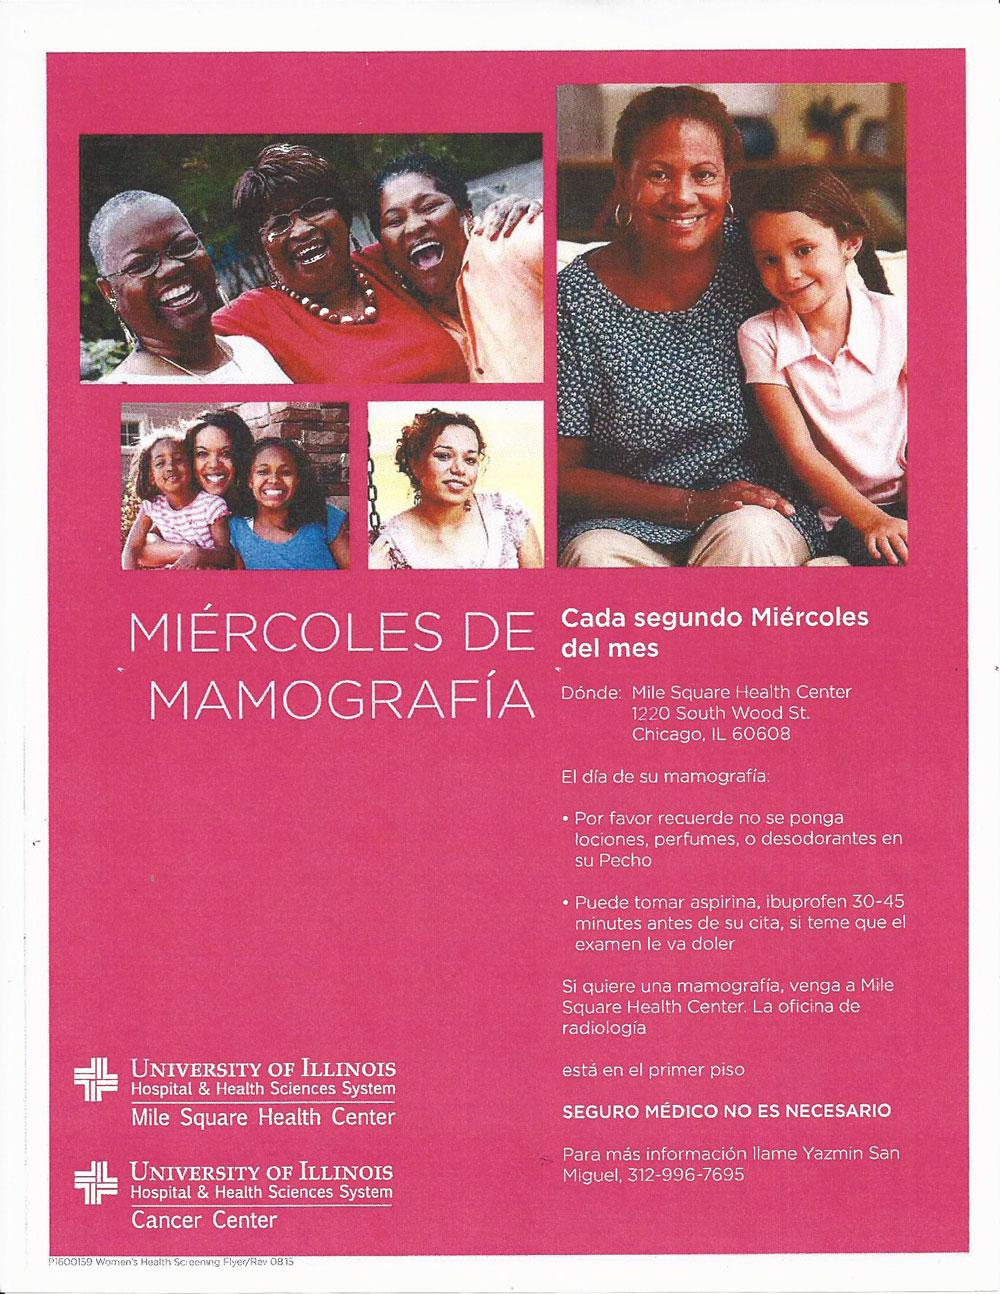 miercoles-de-mamografia-gratis